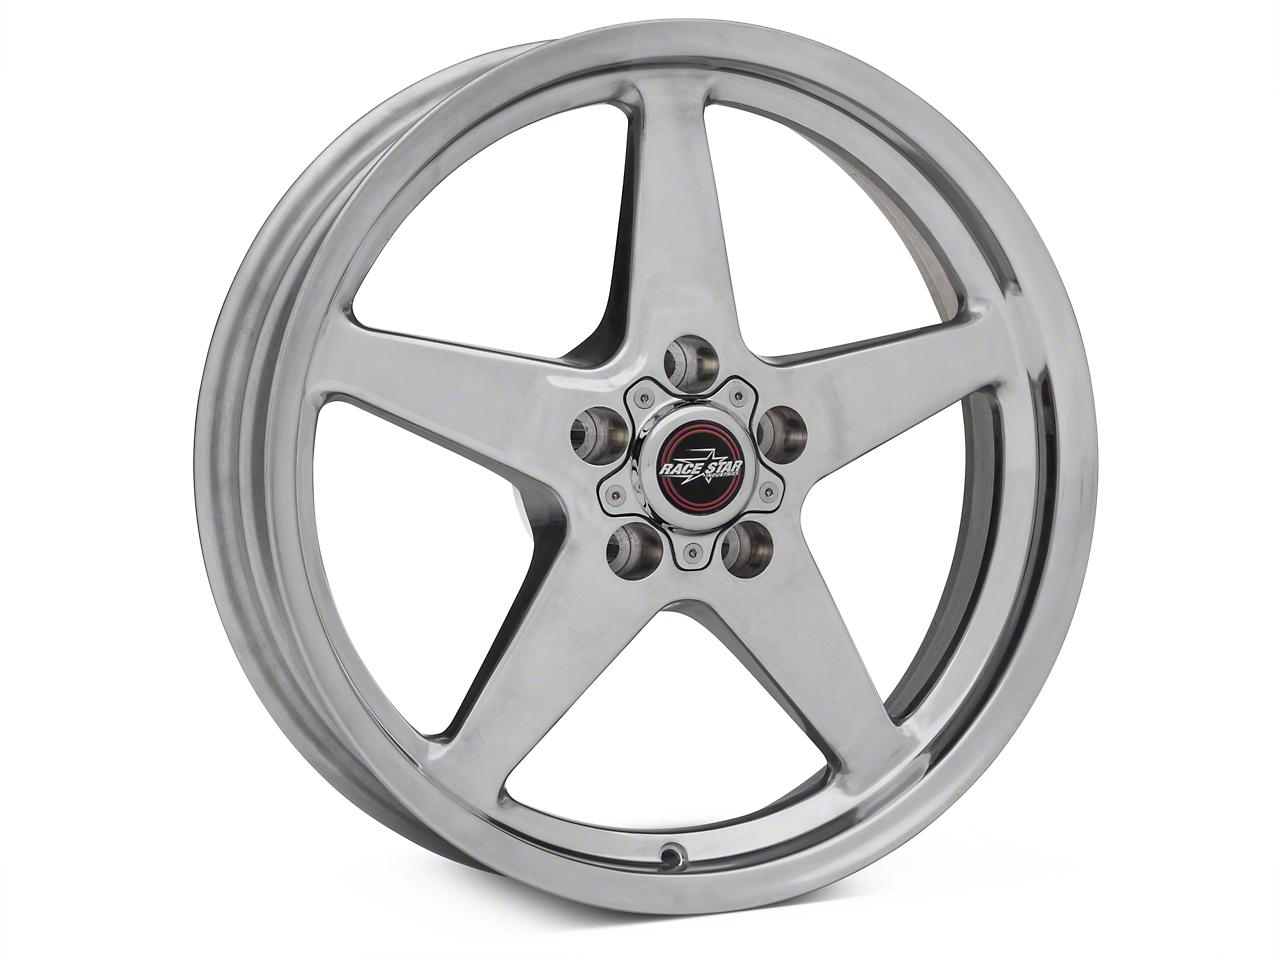 Race Star Drag Star Polished Wheel - Direct Drill - 18x5 (05-14 All)